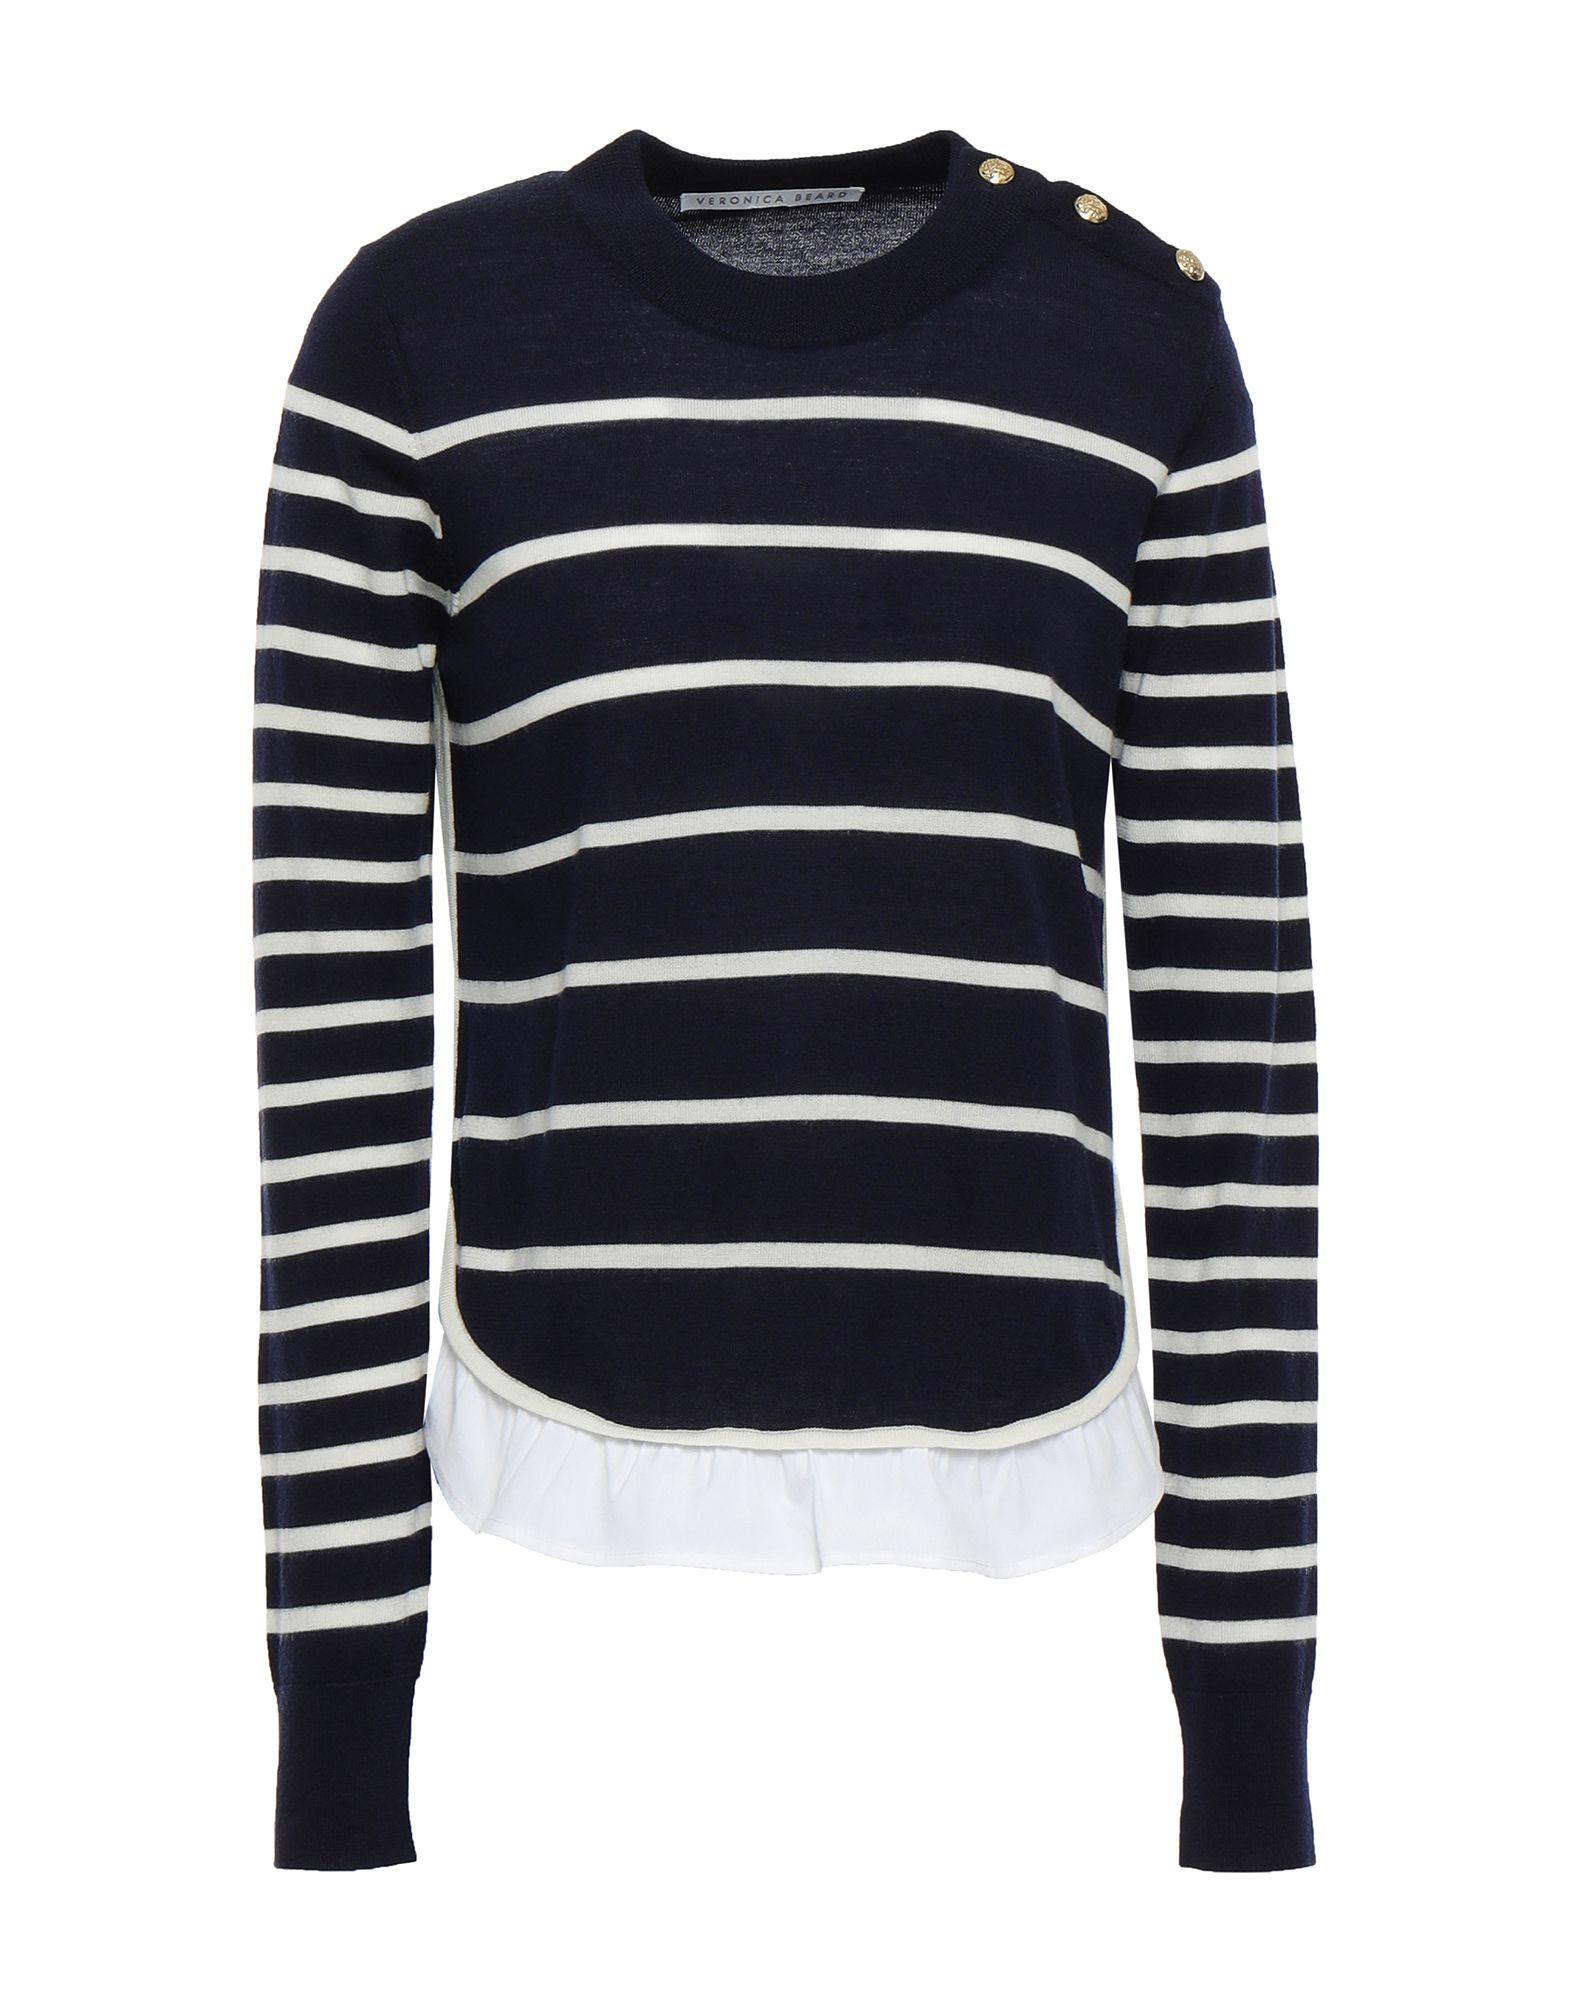 VERONICA BEARD Sweaters. plain weave, knitted, no appliqués, lightweight knit, round collar, stripes, long sleeves, no pockets, button closing, side closure. 100% Merino Wool, Cotton, Elastane